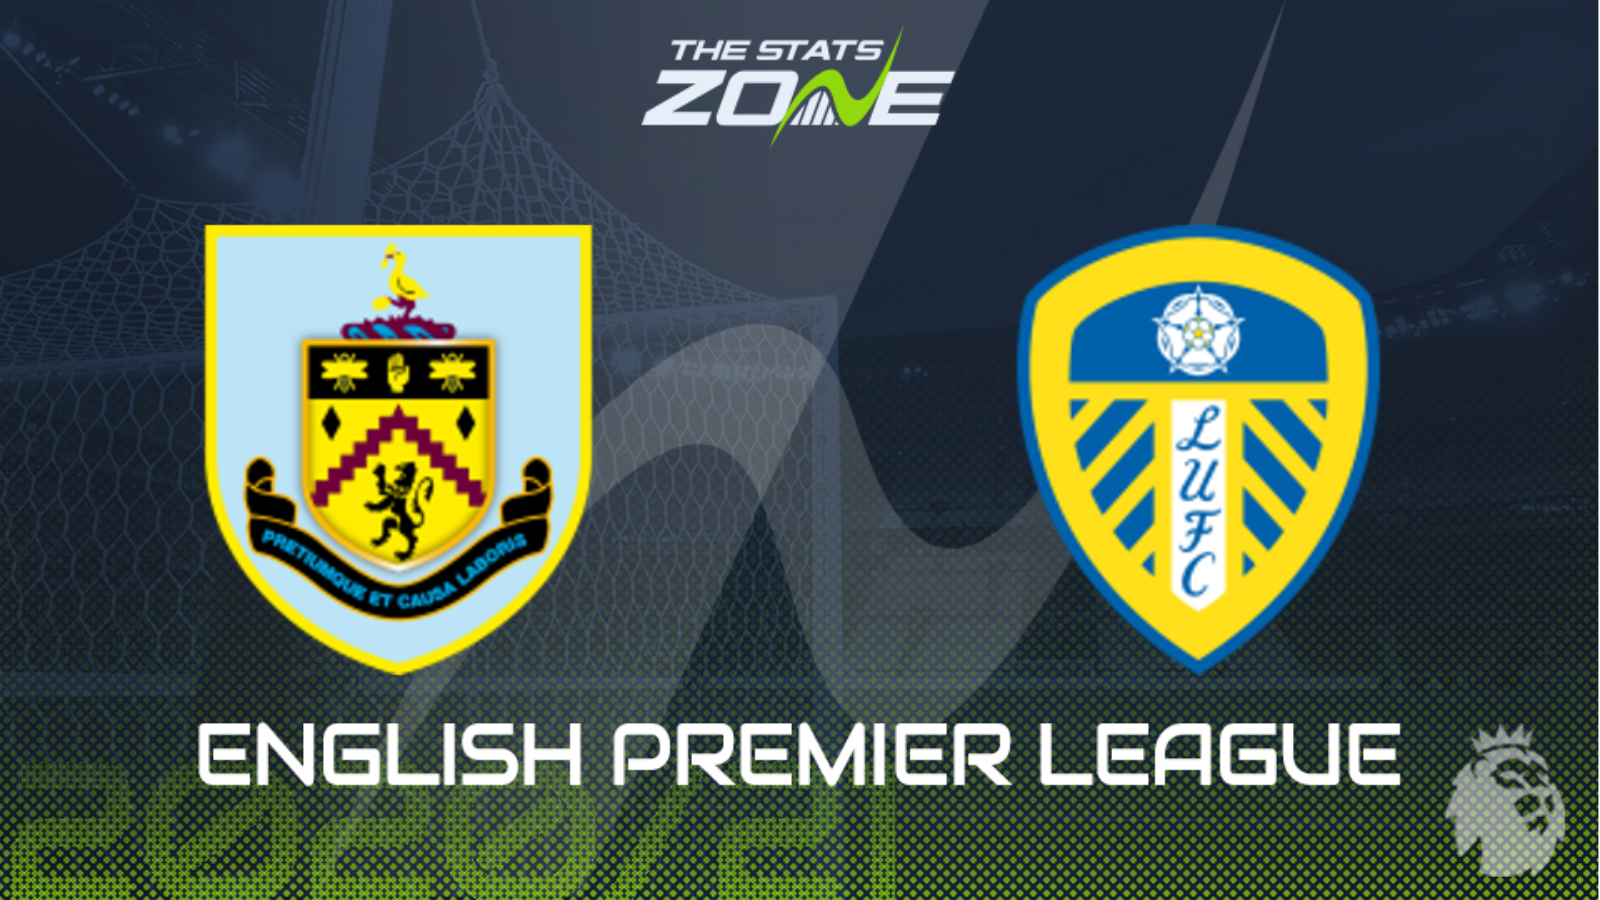 Burnley vs Leeds Utd Highlights – Premier League 2020/21